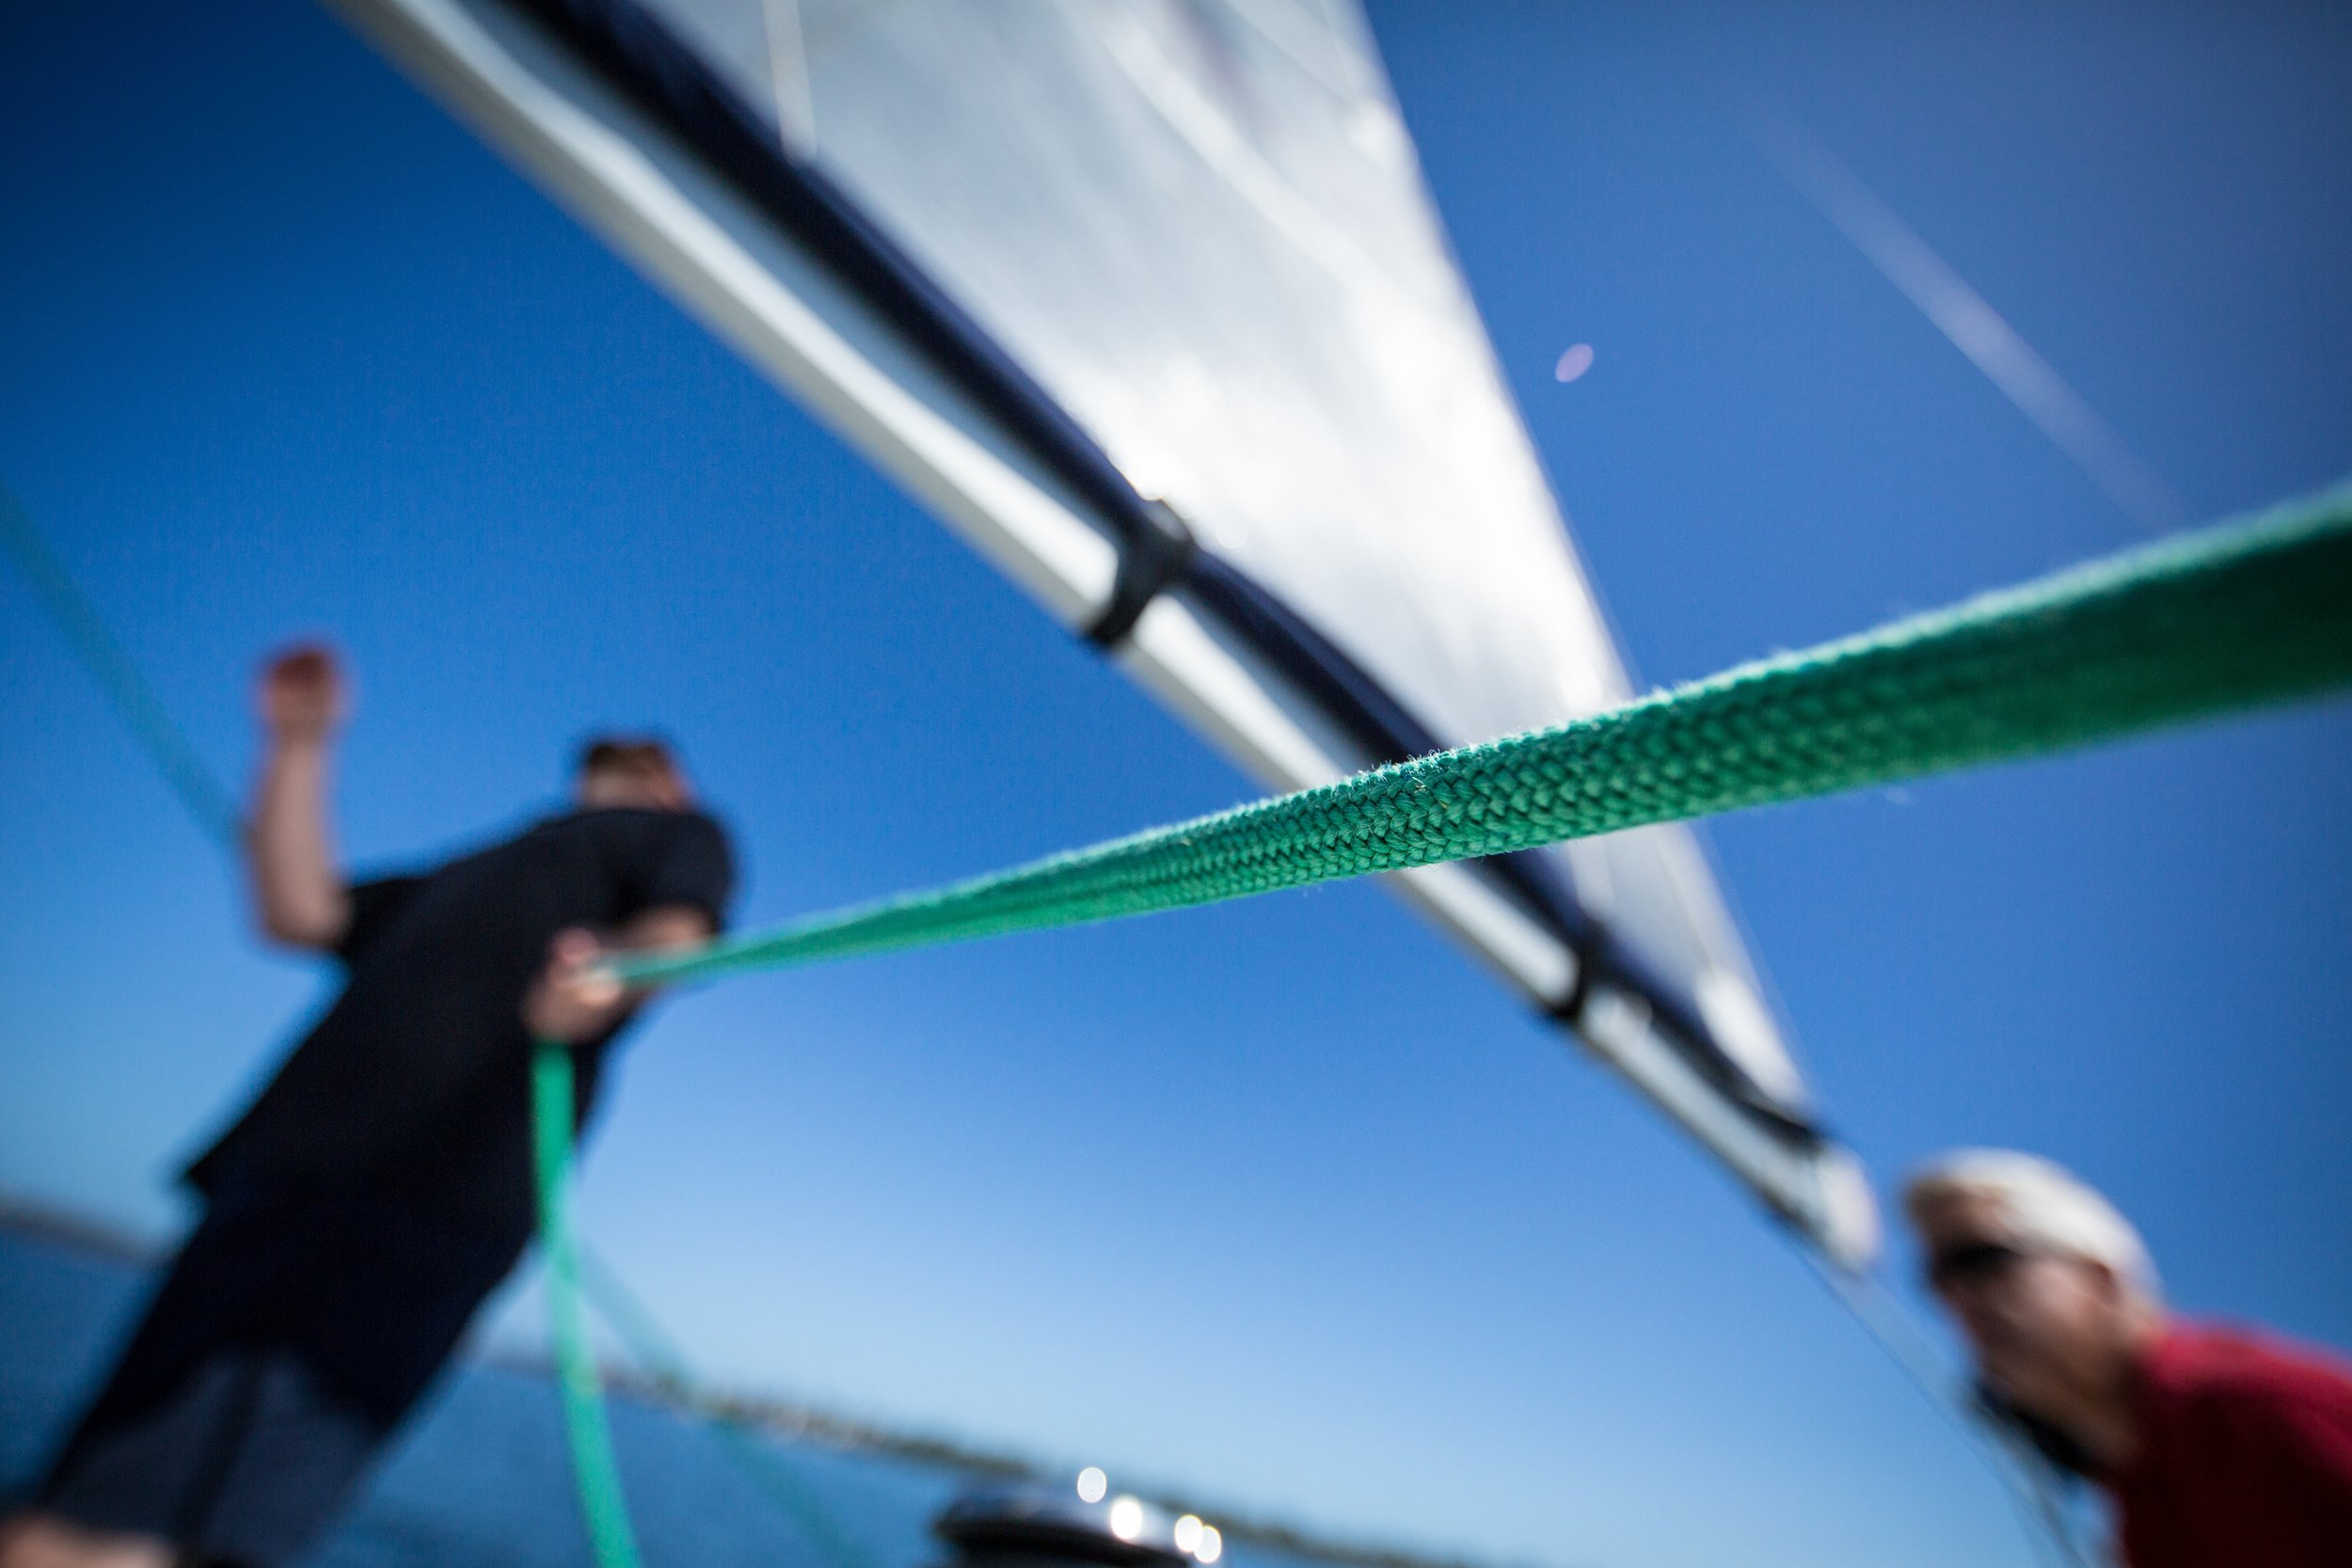 sail trimming - yacht racing